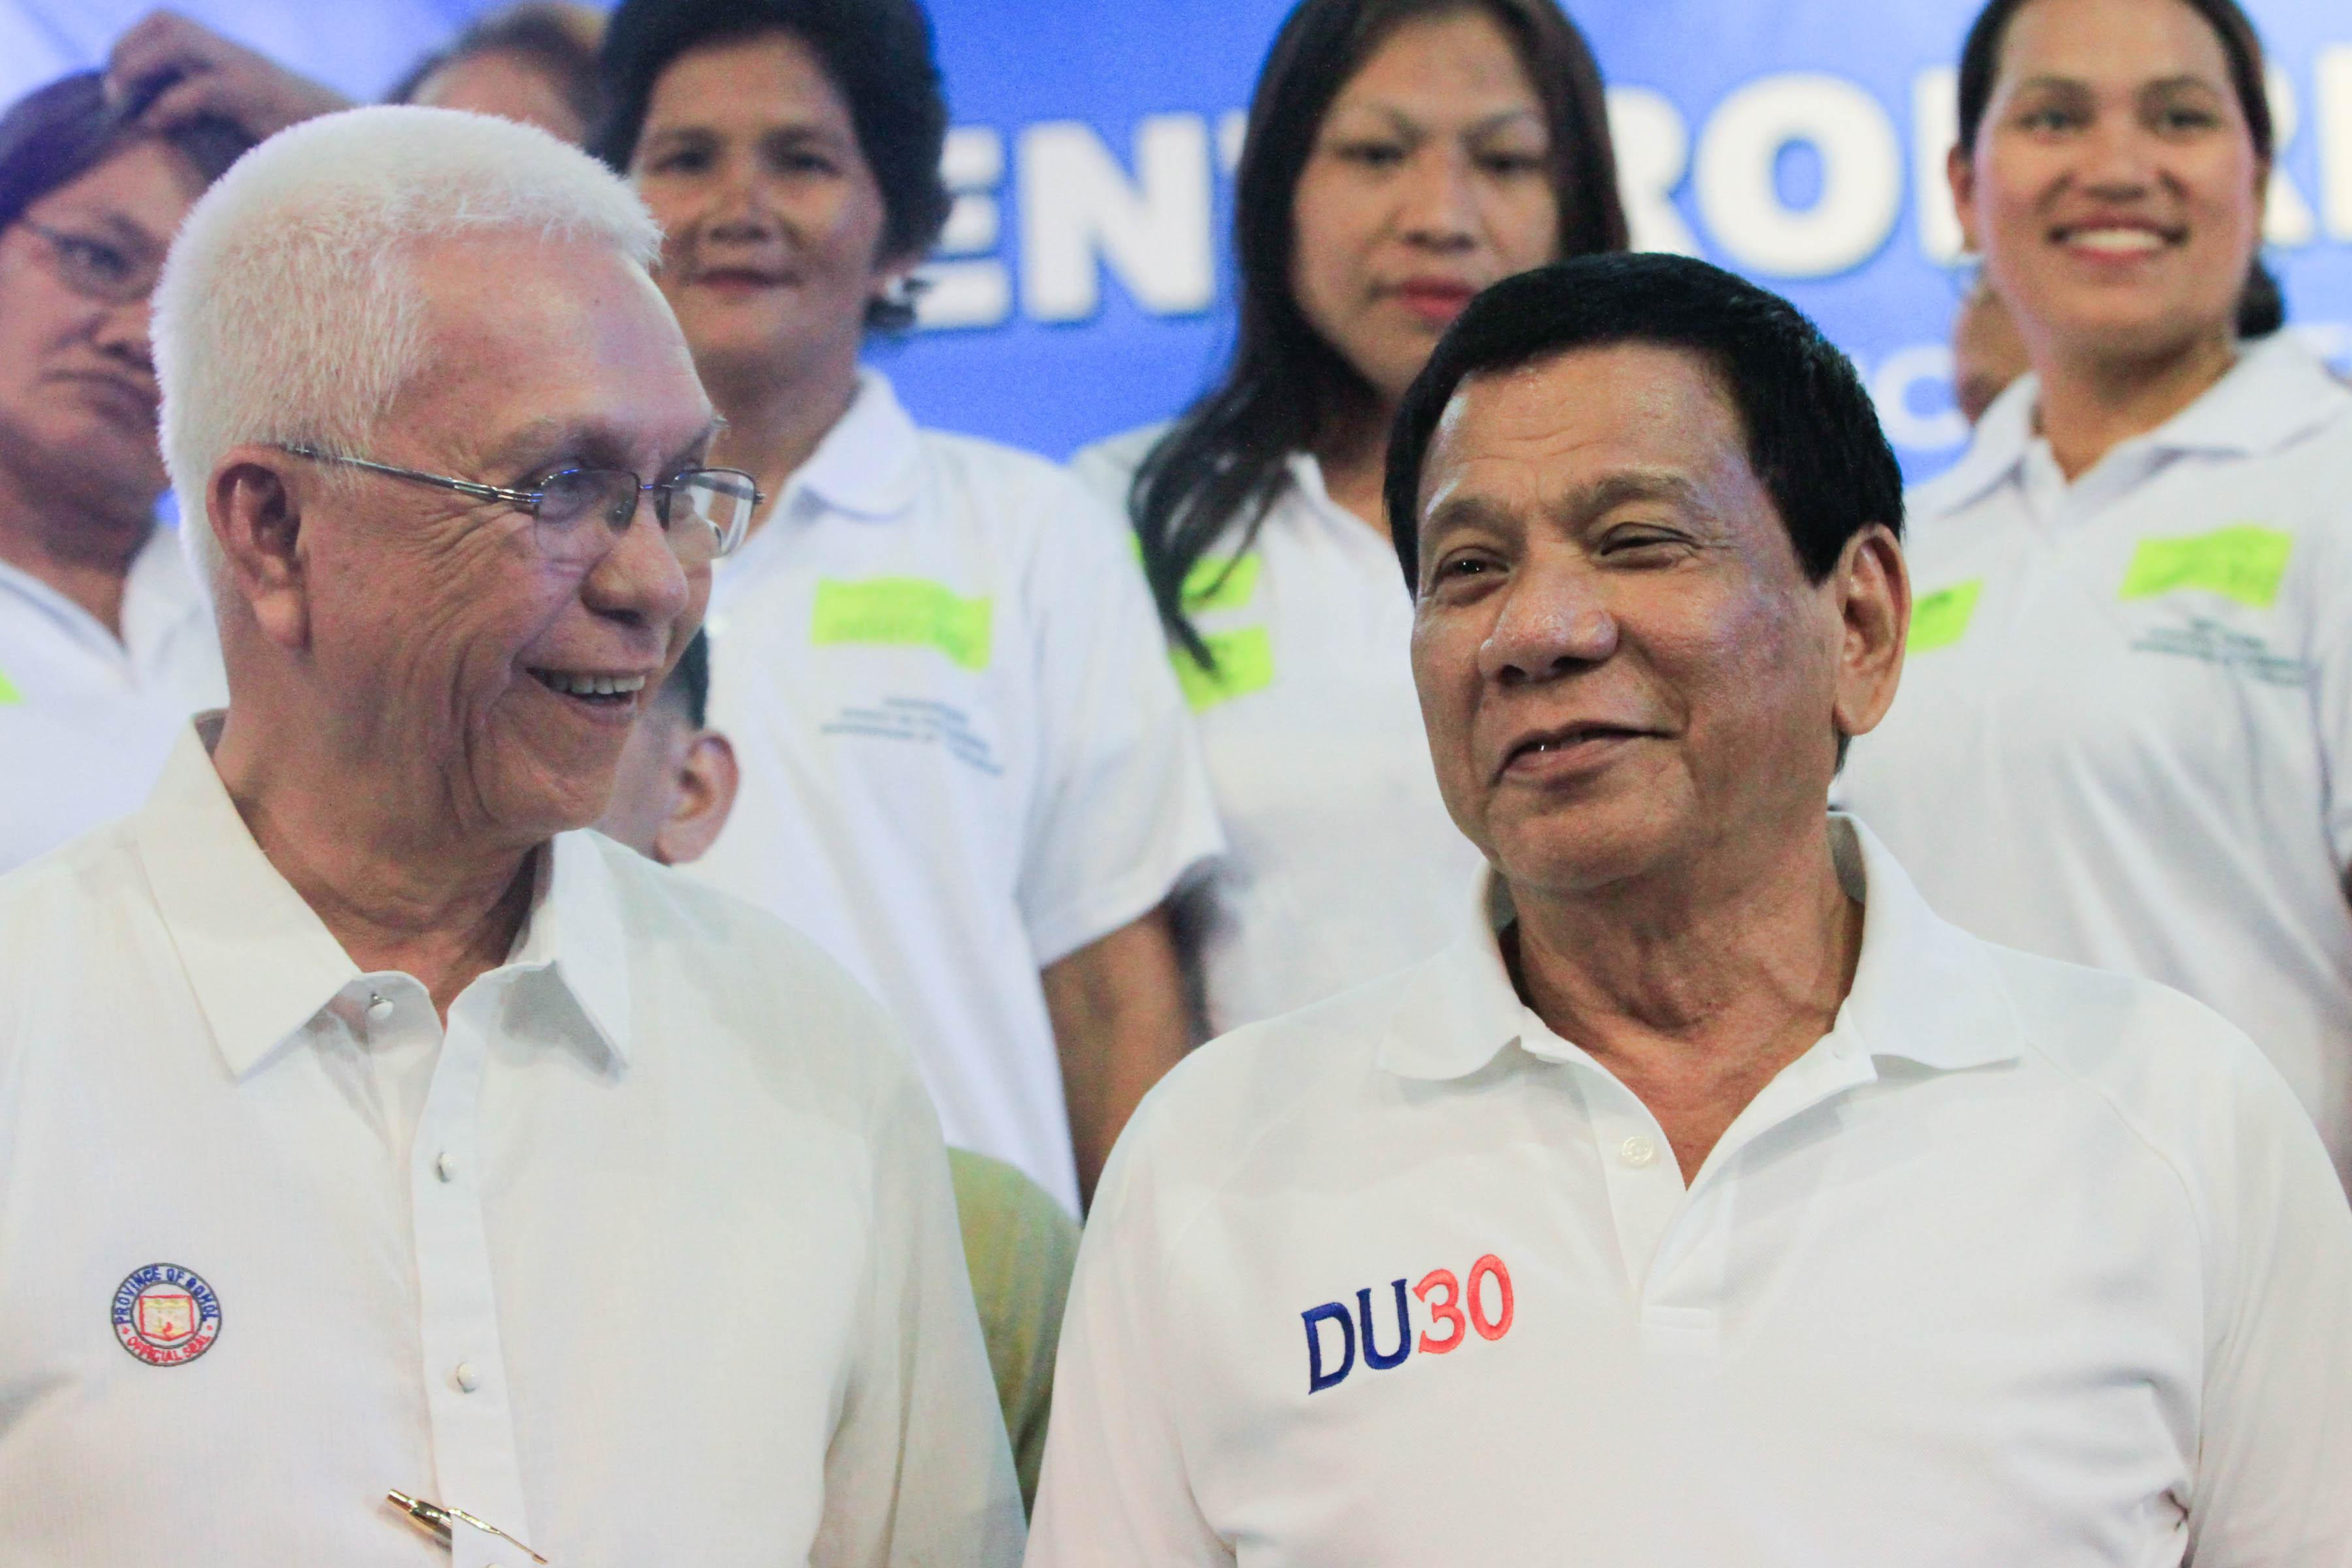 TWO BIRTHDAYS, TWO FRIENDS. Cabinet Secretary Jun Evasco and President Rodrigo Duterte sit together at a housing summit in February 2016. Malacau00f1ang photo